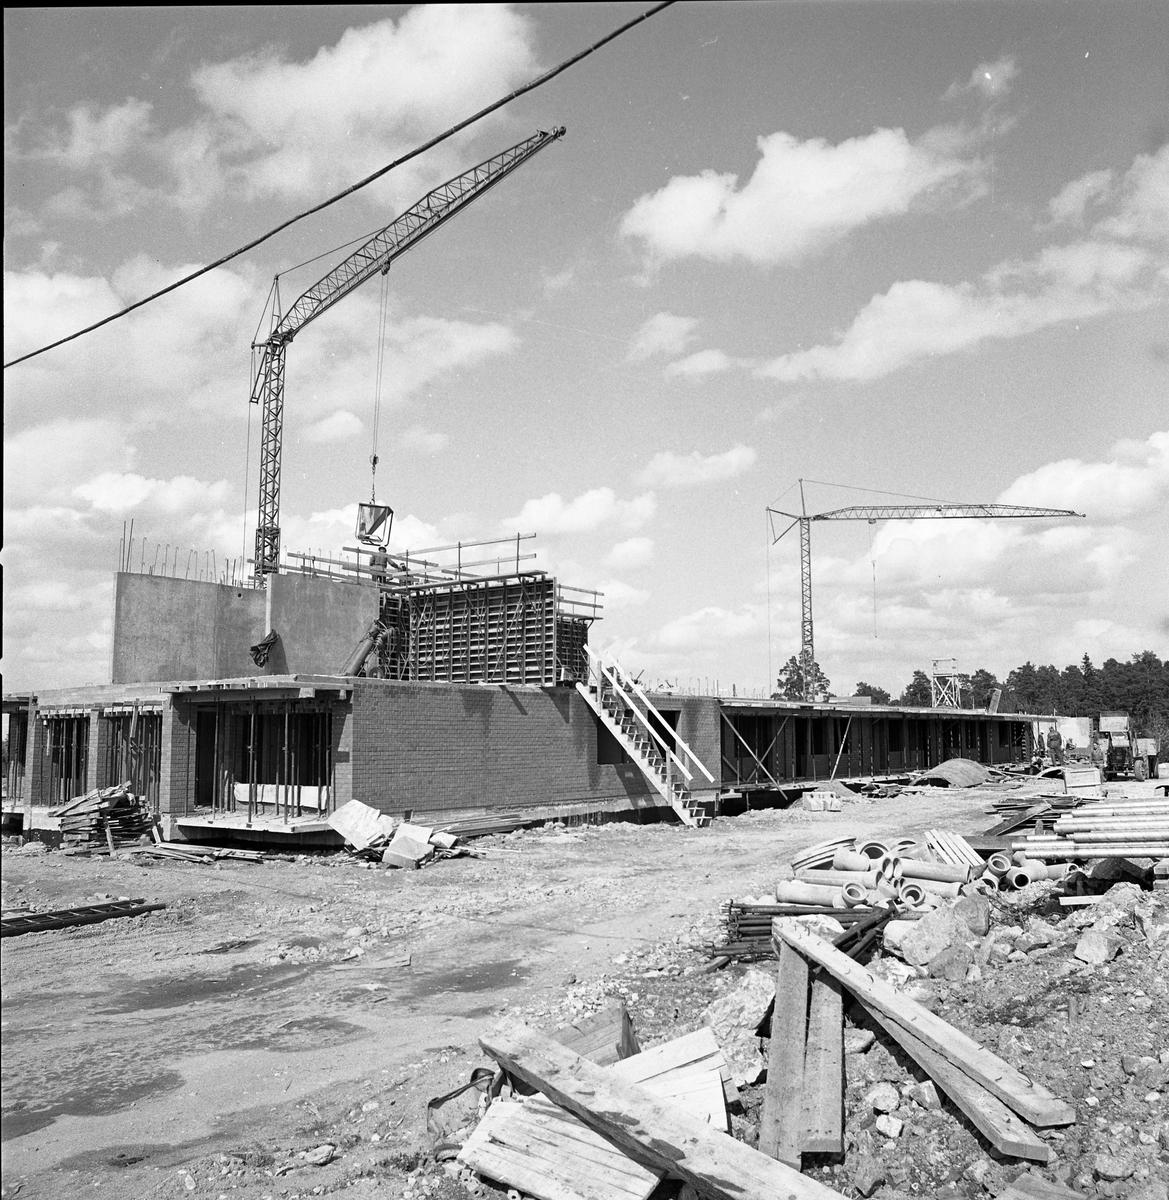 Byggnadsfirma Lunds nybygge på Brattberget Lyftkran, tegel, rör